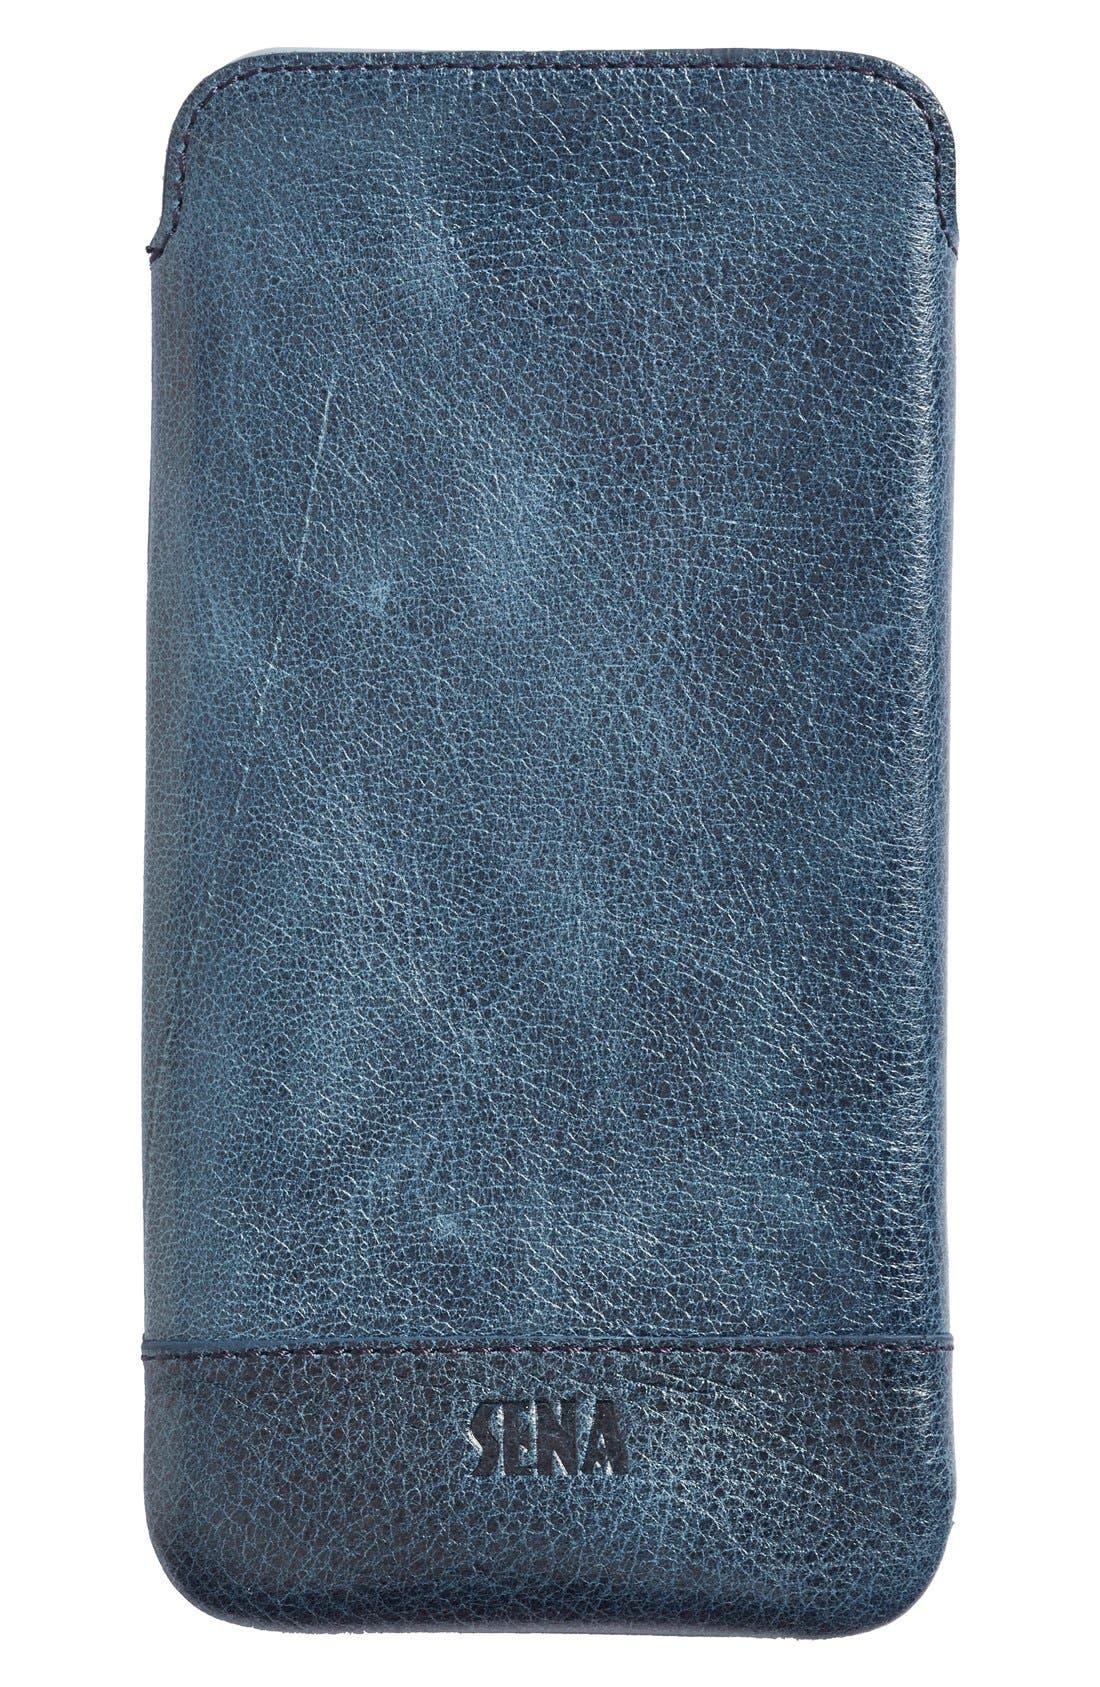 SENA Heritage - Ultra Slim Leather iPhone 6